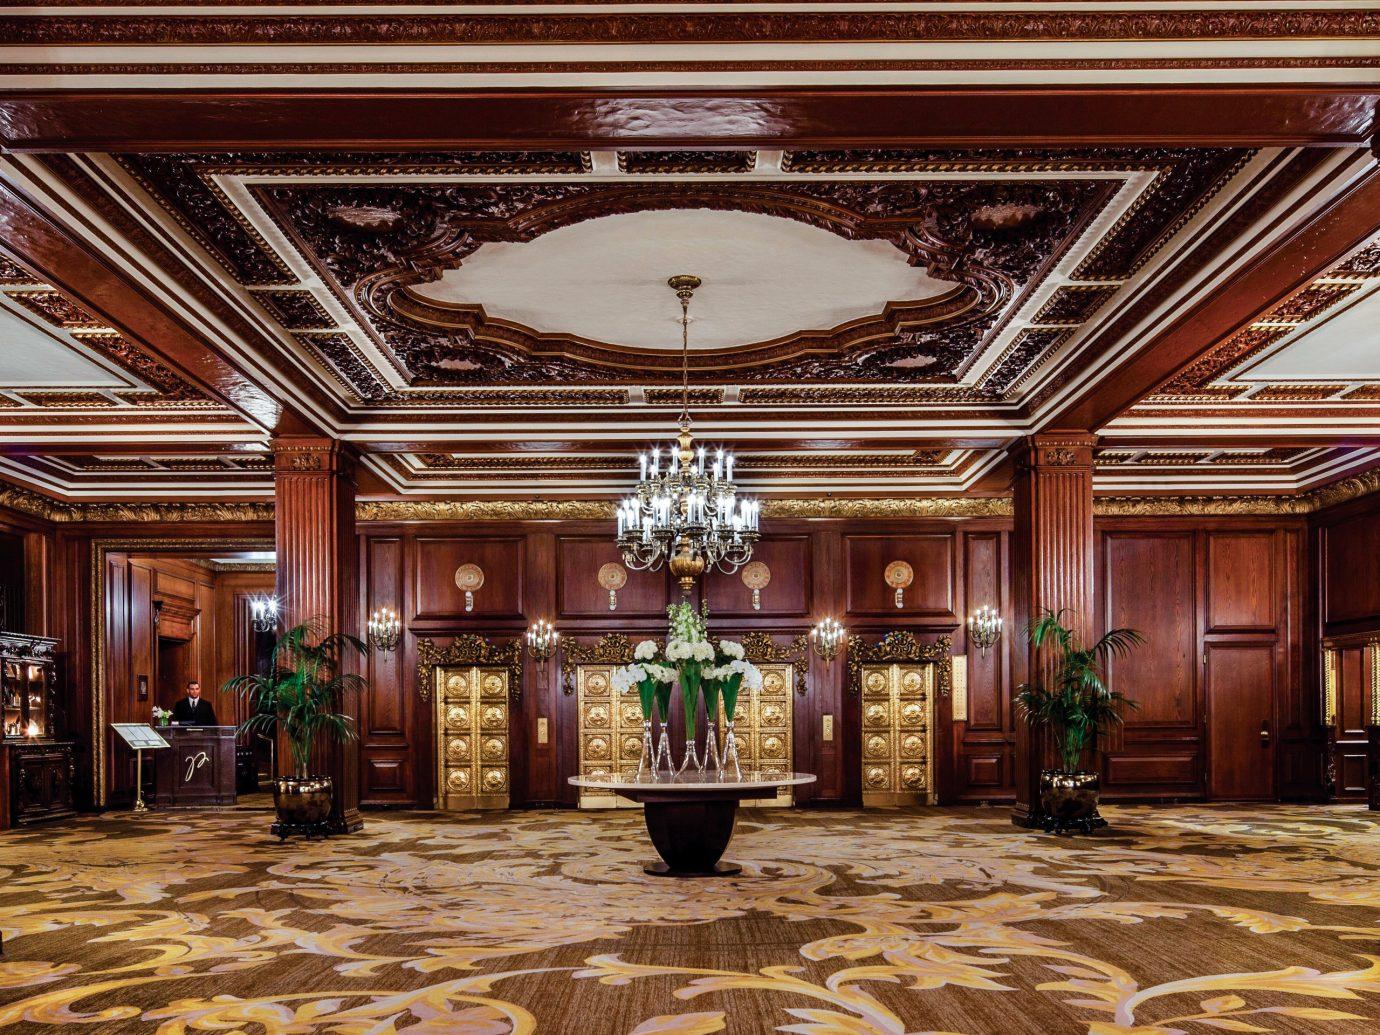 Hotels indoor Lobby building interior design ceiling estate function hall ballroom hall fancy